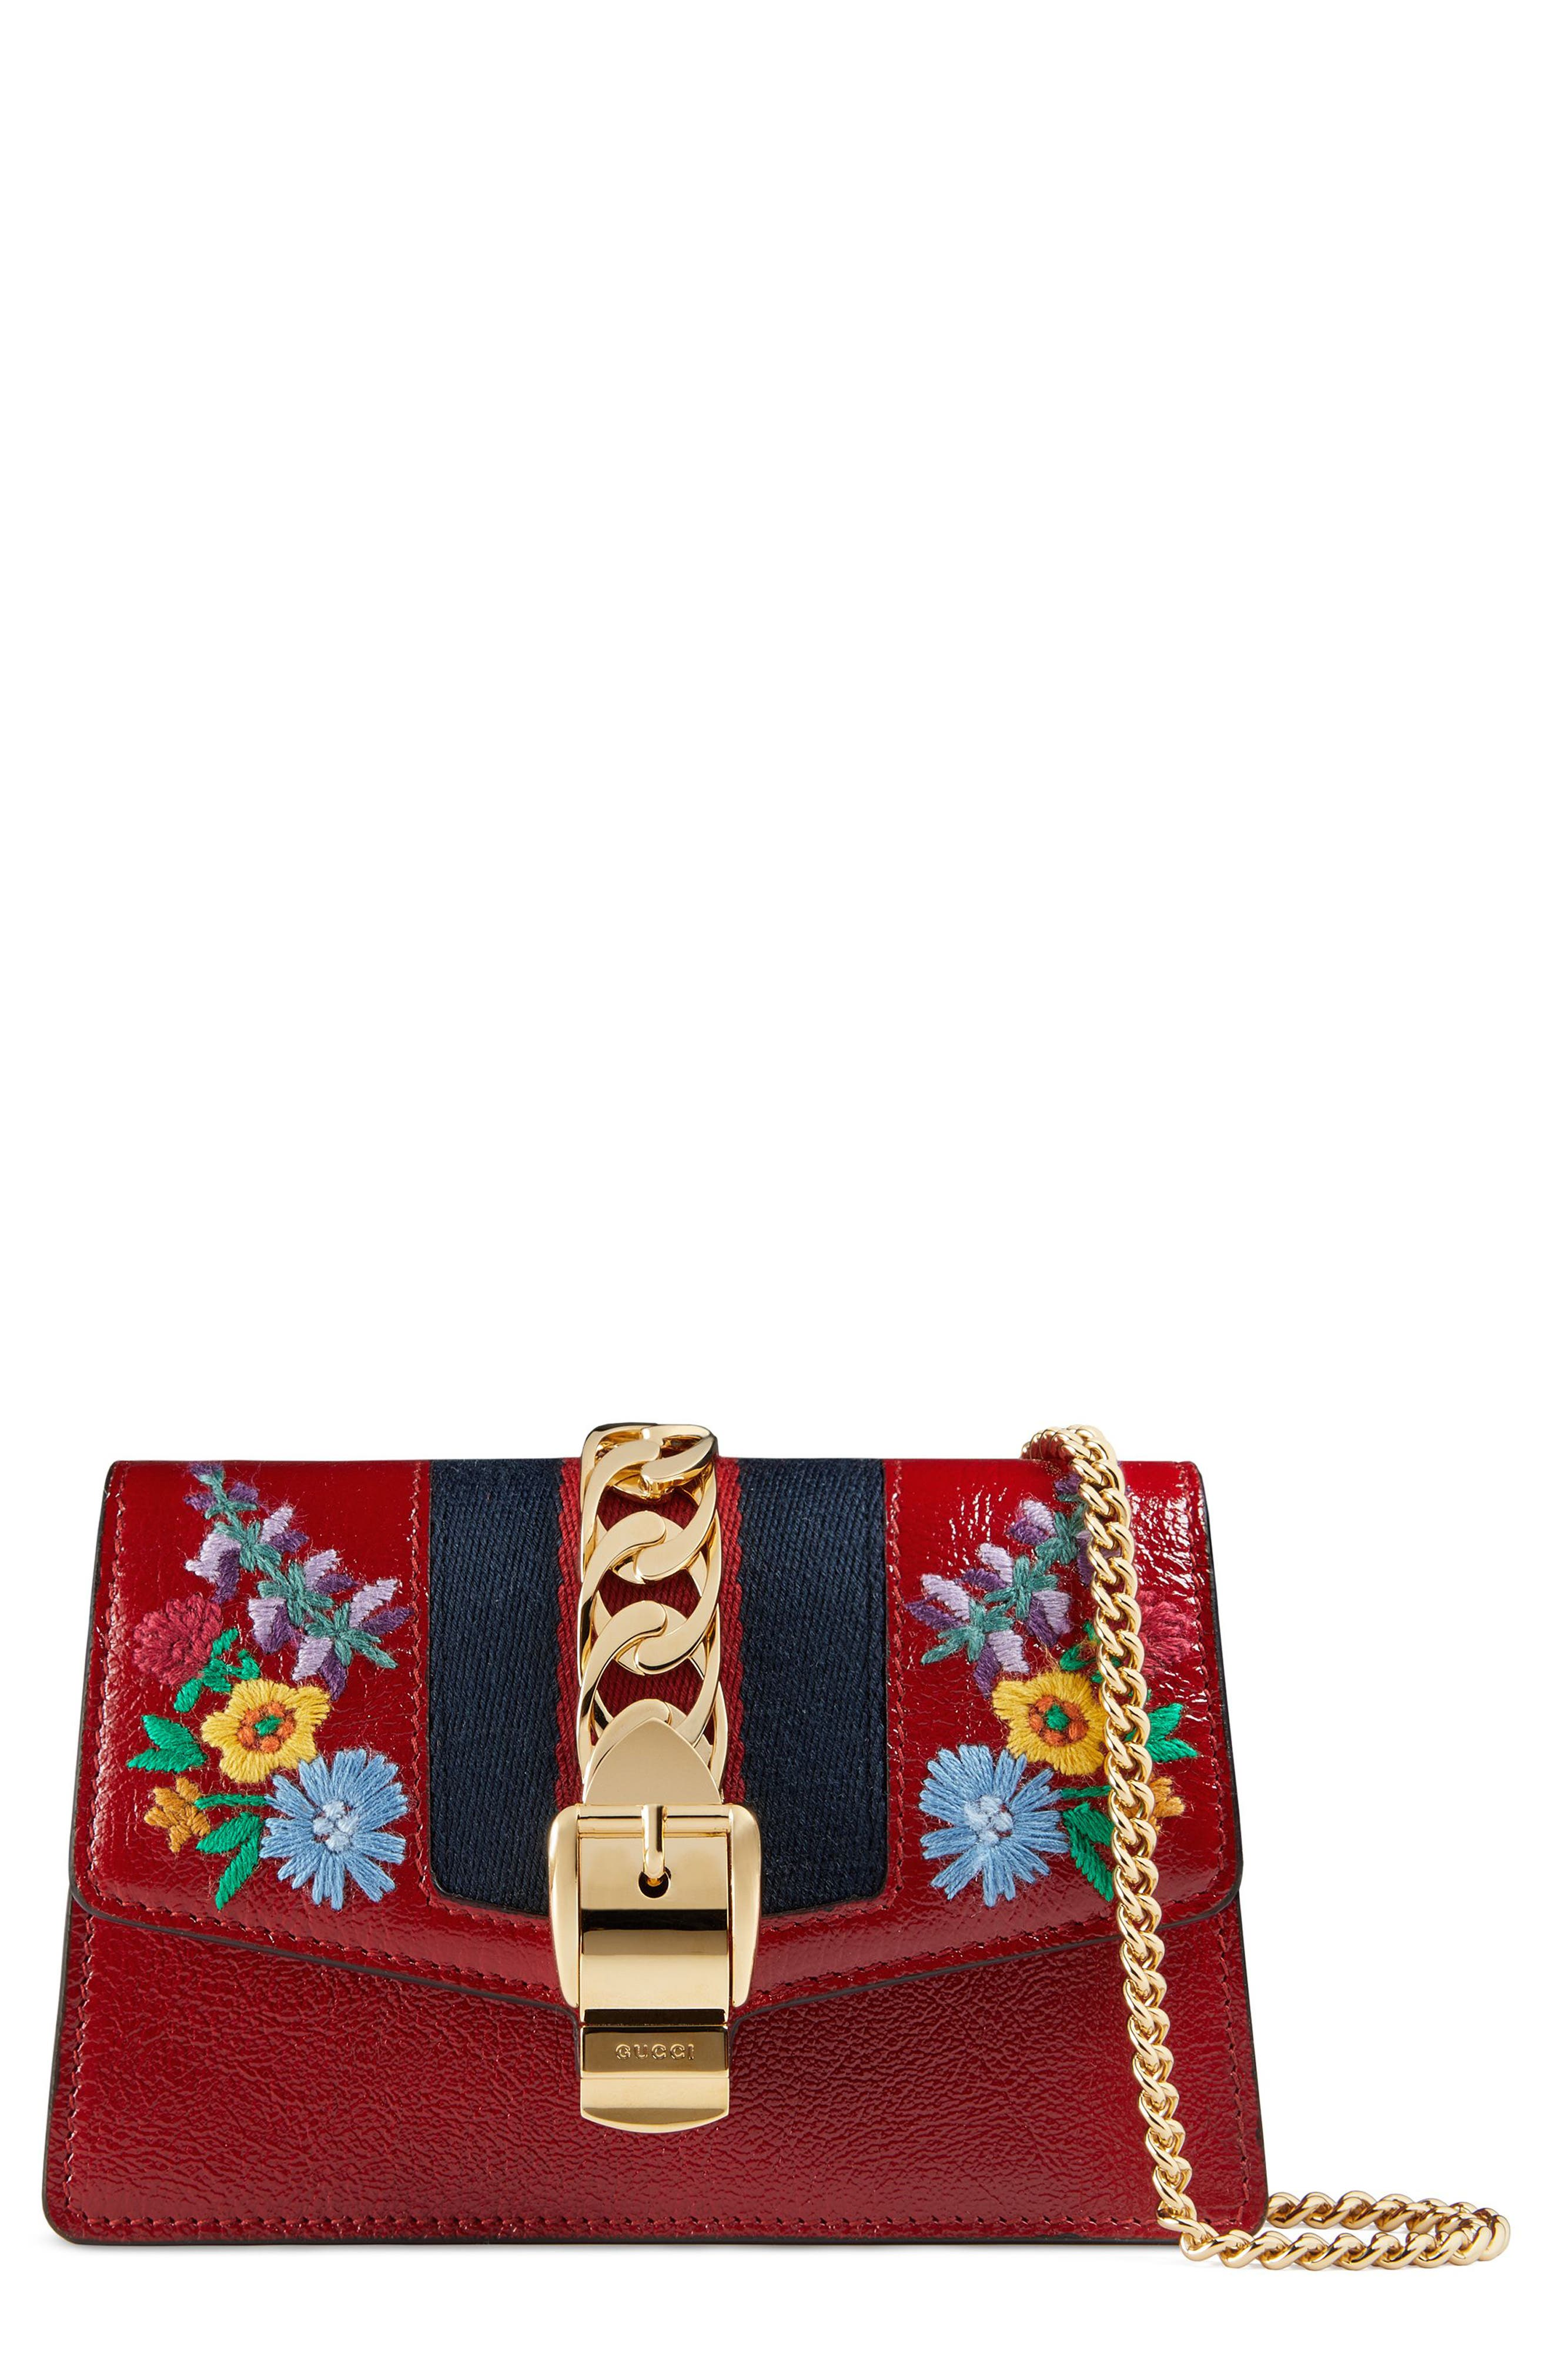 517d65e37cc Gucci Women s Wallets On A Chain Handbags